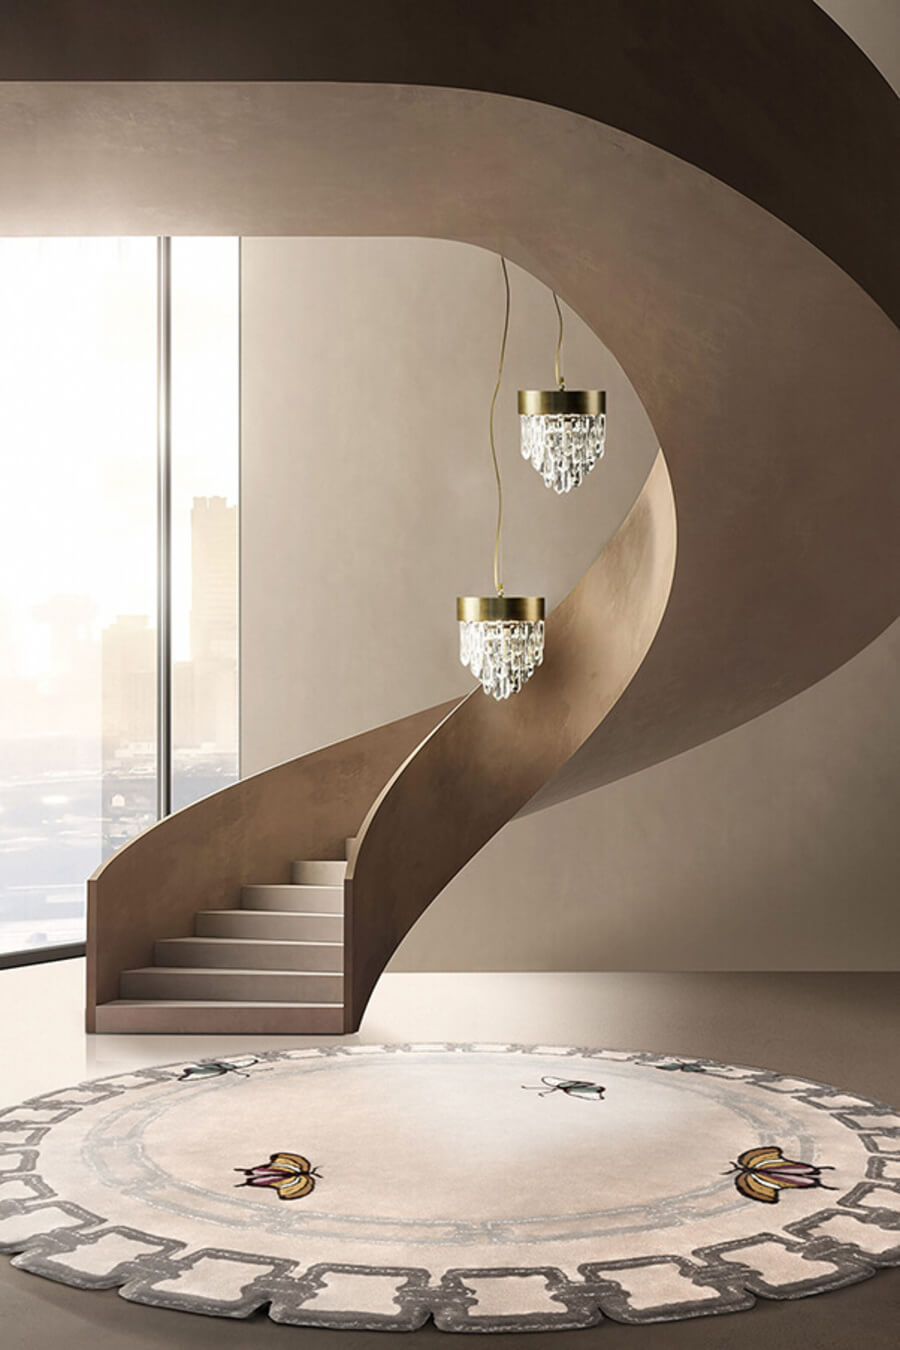 Interior Design Inspiration - Entryway & Hallway